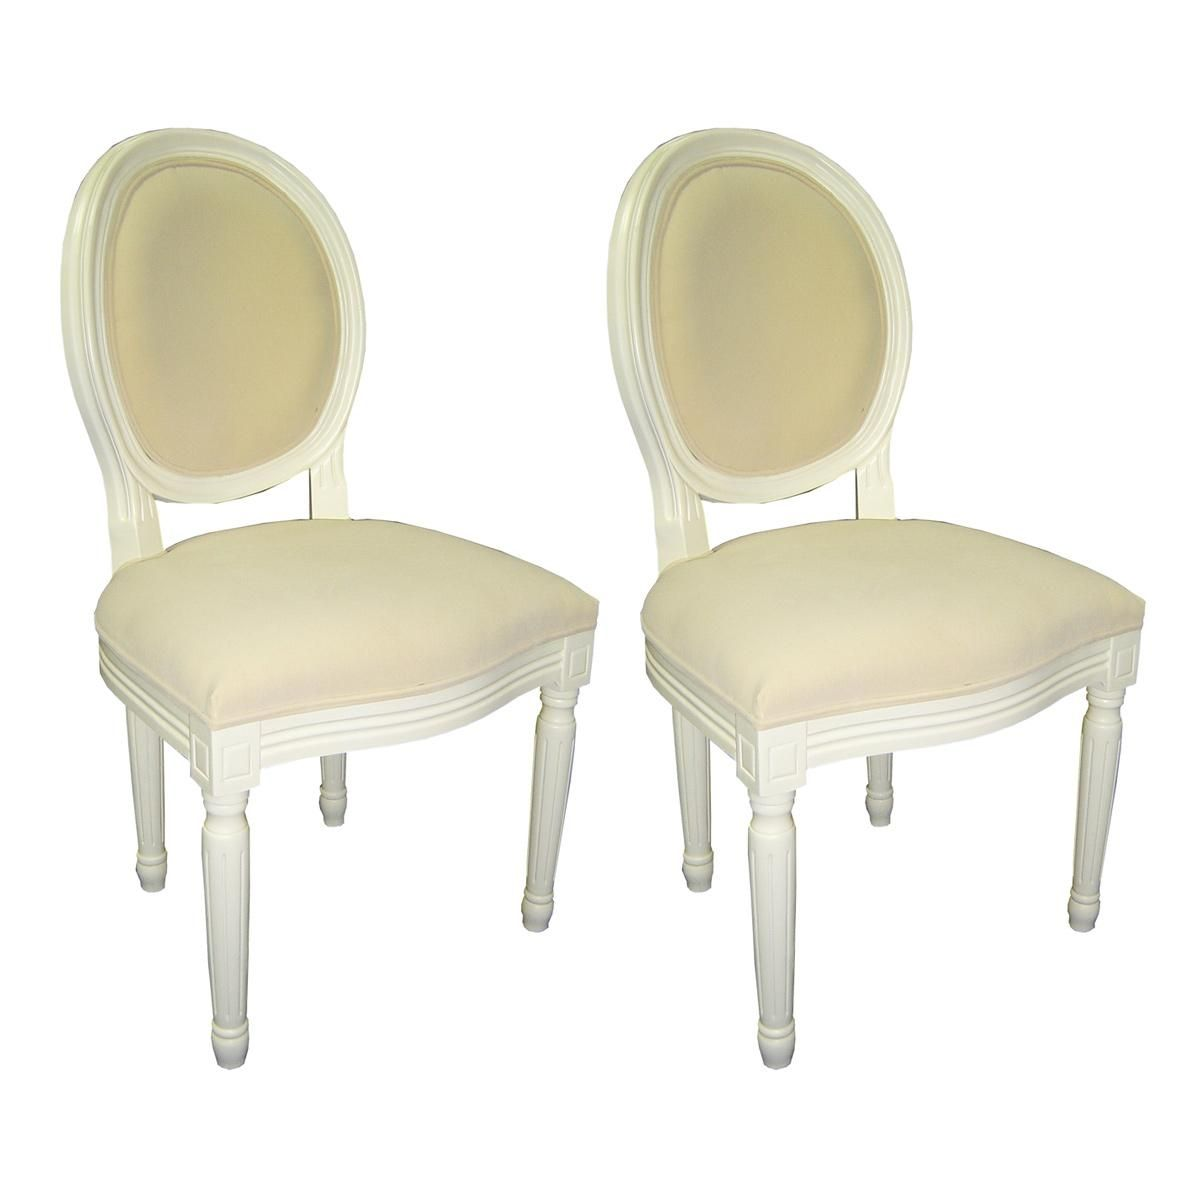 Chaise Baroque Salle A Manger Blanc Medaillon Lot De 2 Miliboo Chaise Baroque Salle A Manger Blanche Chaise Contemporaine